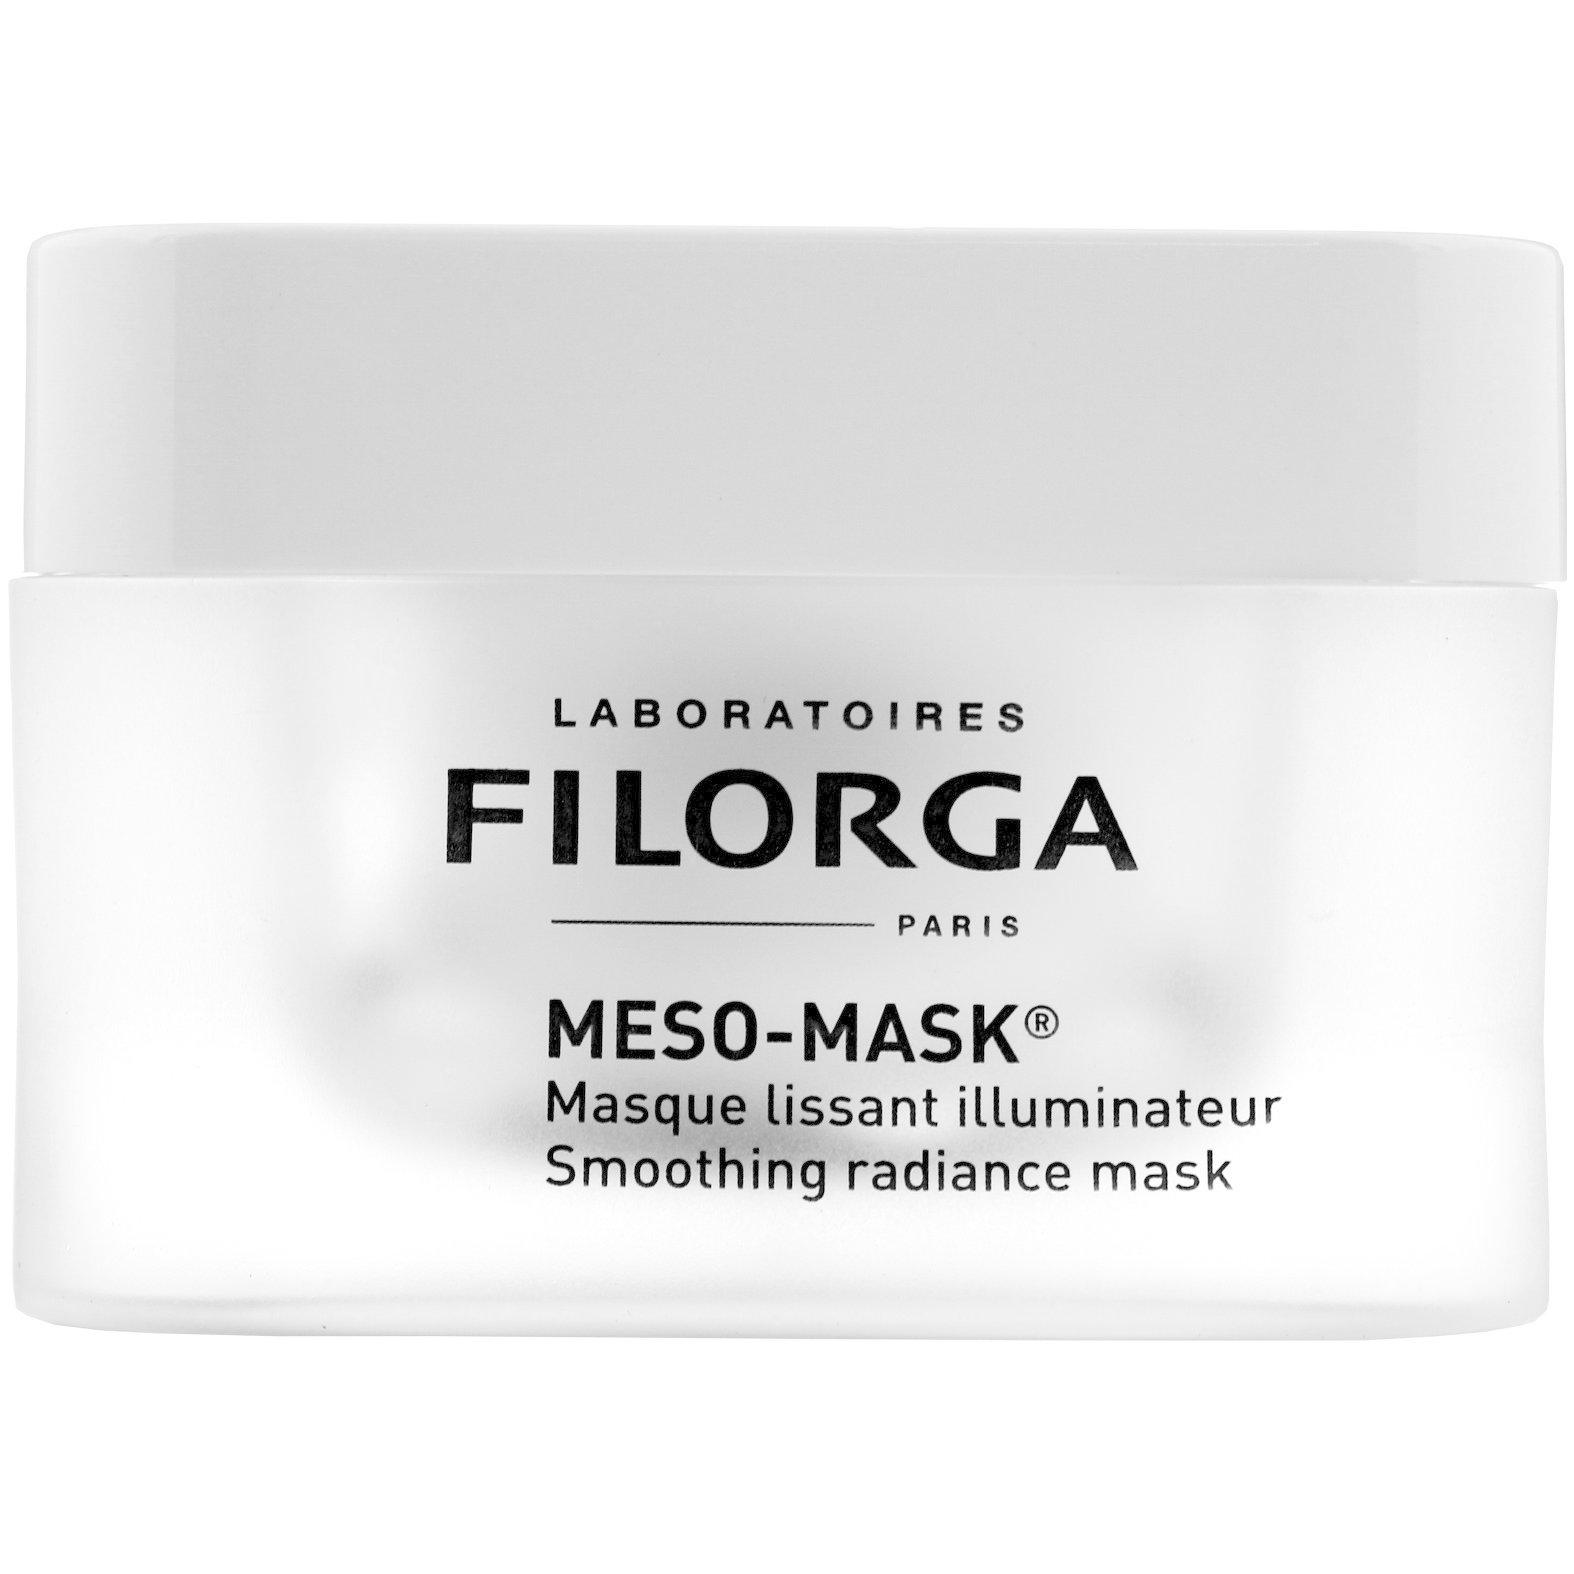 Filorga Meso-Mask Αντιρυτιδική Μάσκα Προσώπου που Επαναφέρει την Λάμψη & Εξαλείφει τα Σημάδια Κούρασης της Επιδερμίδας 50ml